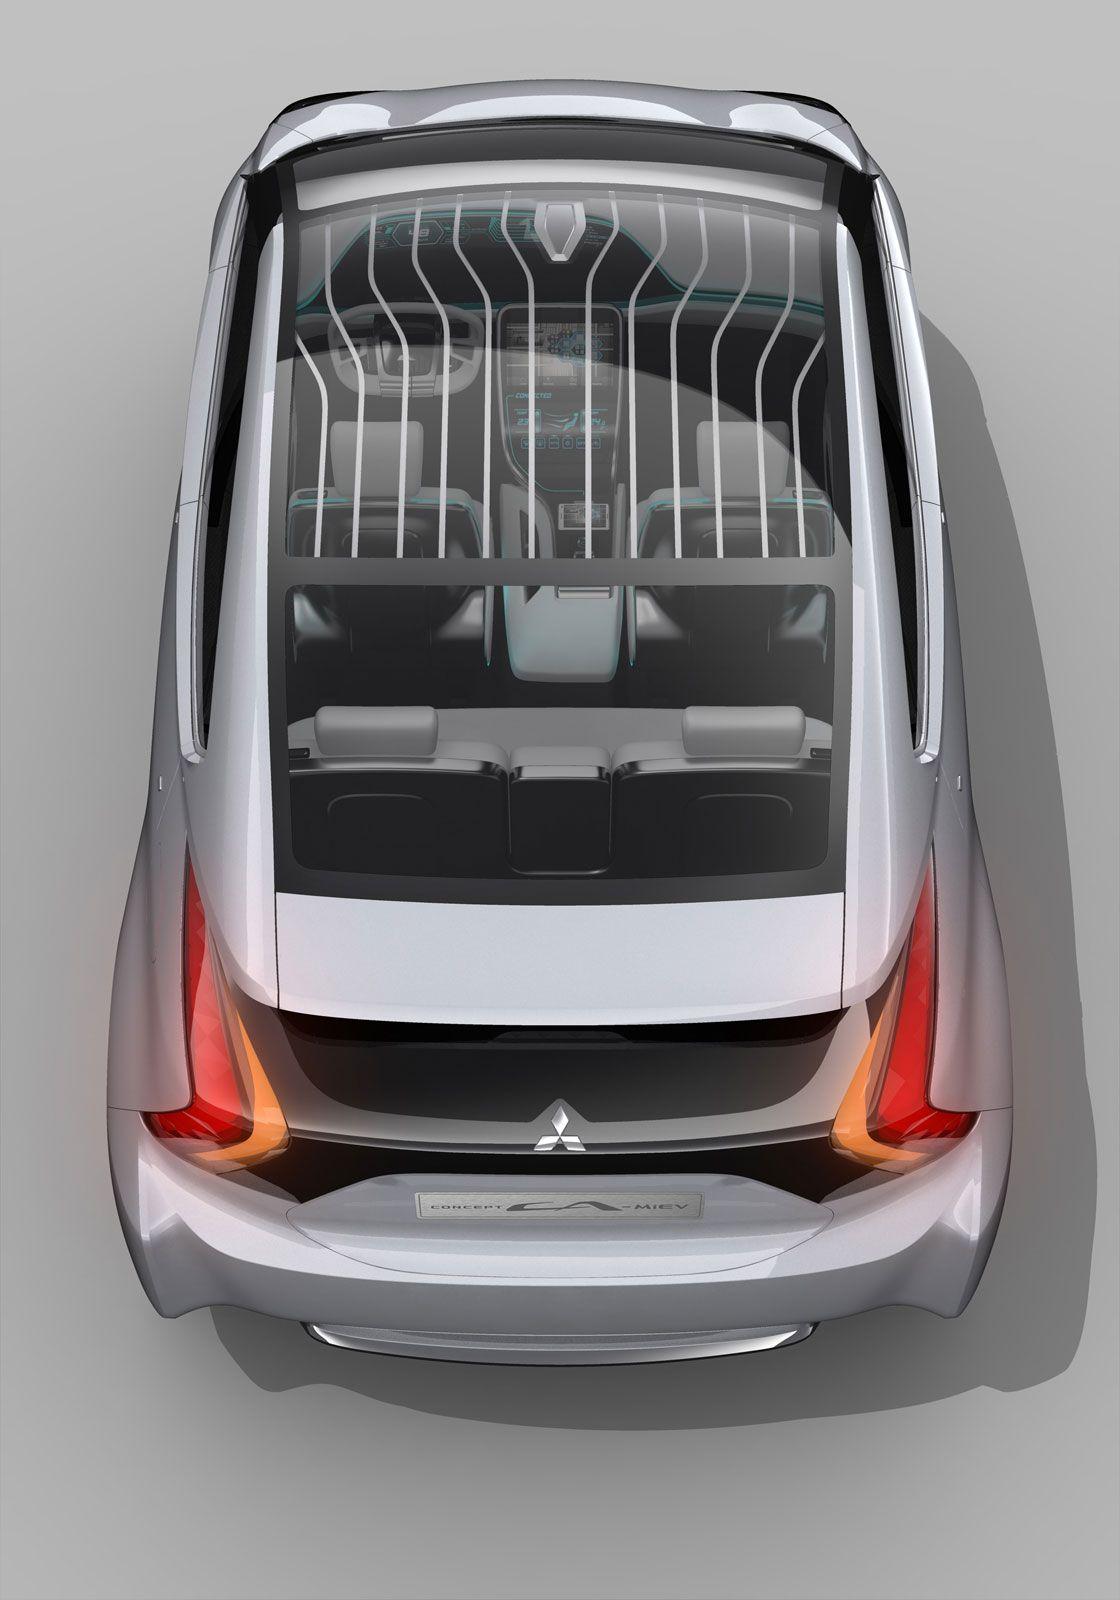 2013 Mitsubishi CAMiEV Концептуальные машины